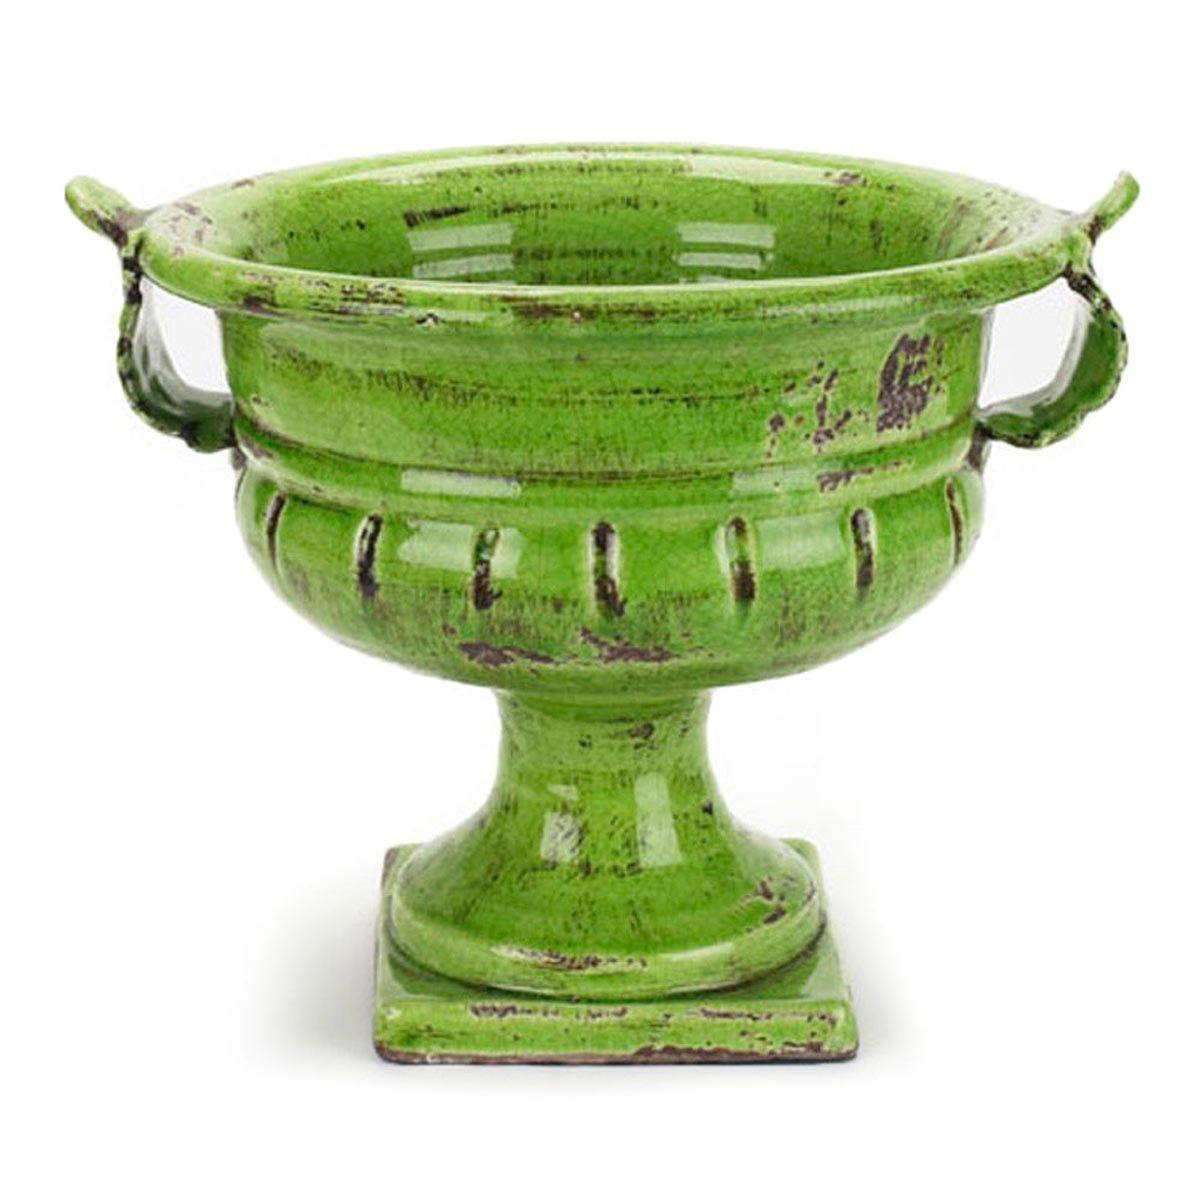 Acanthus Compote, Green Plum & Post Dessert bowls